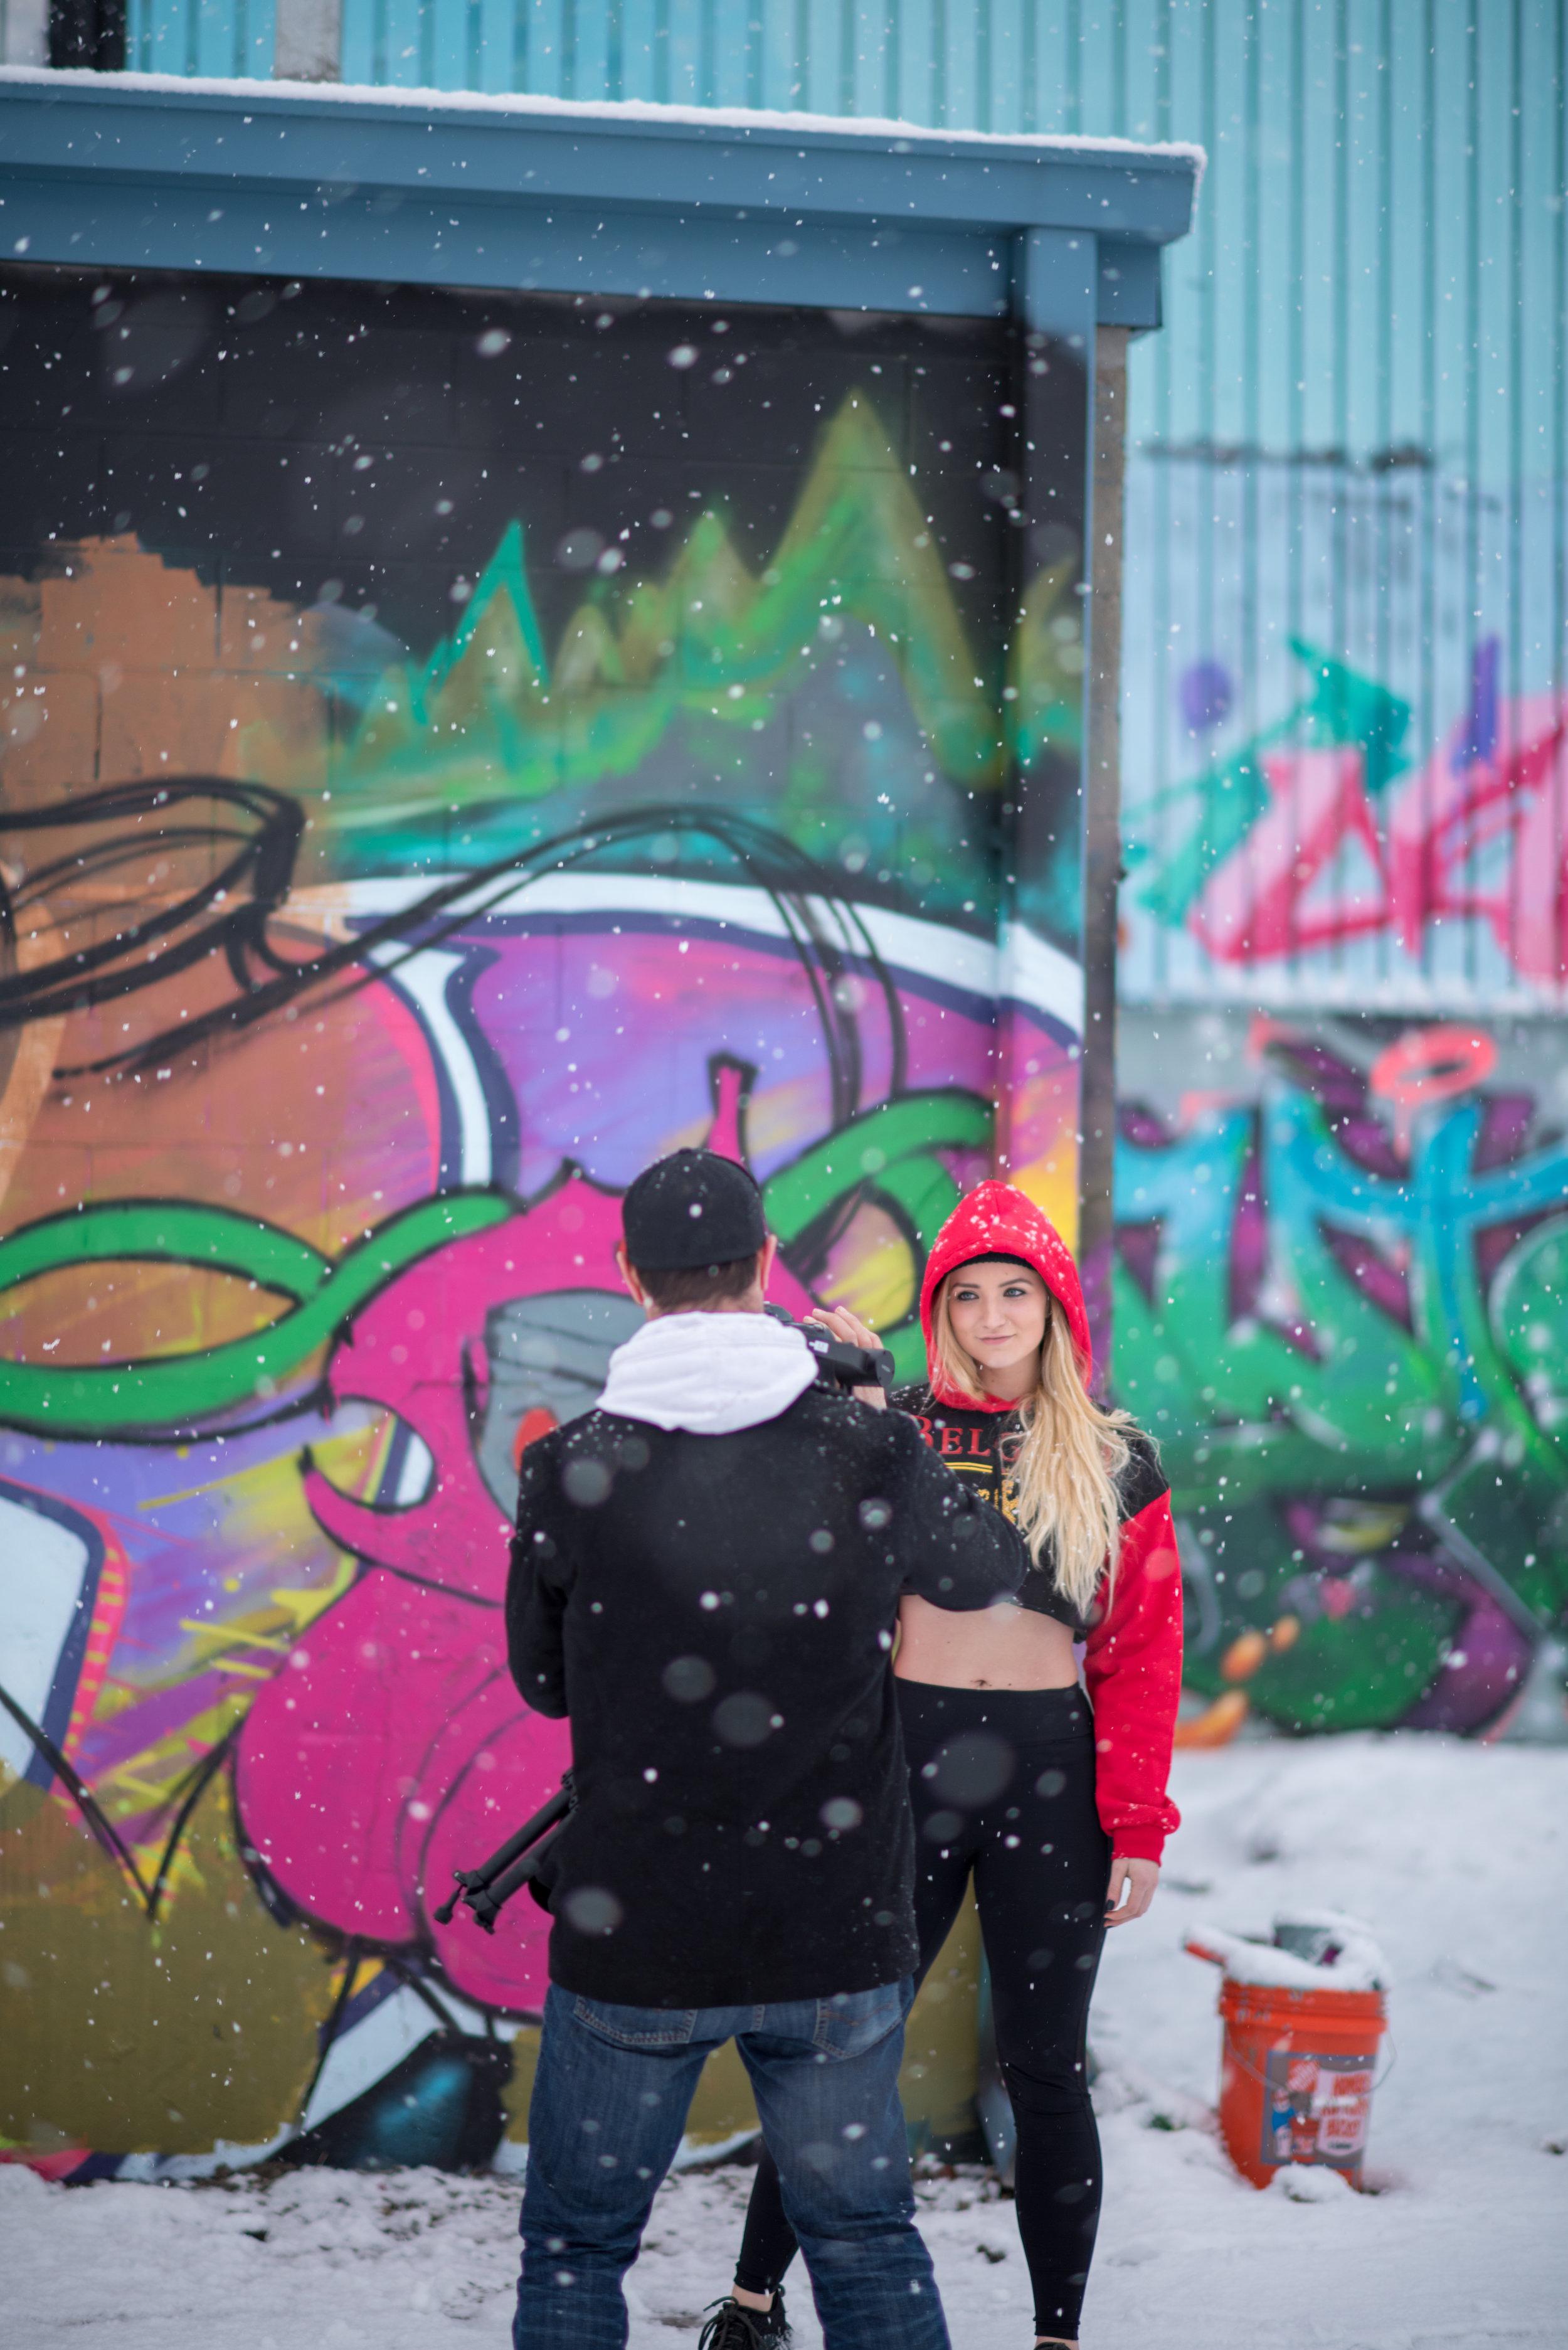 Kaereilly Snow Shoot-BTS (3).jpg